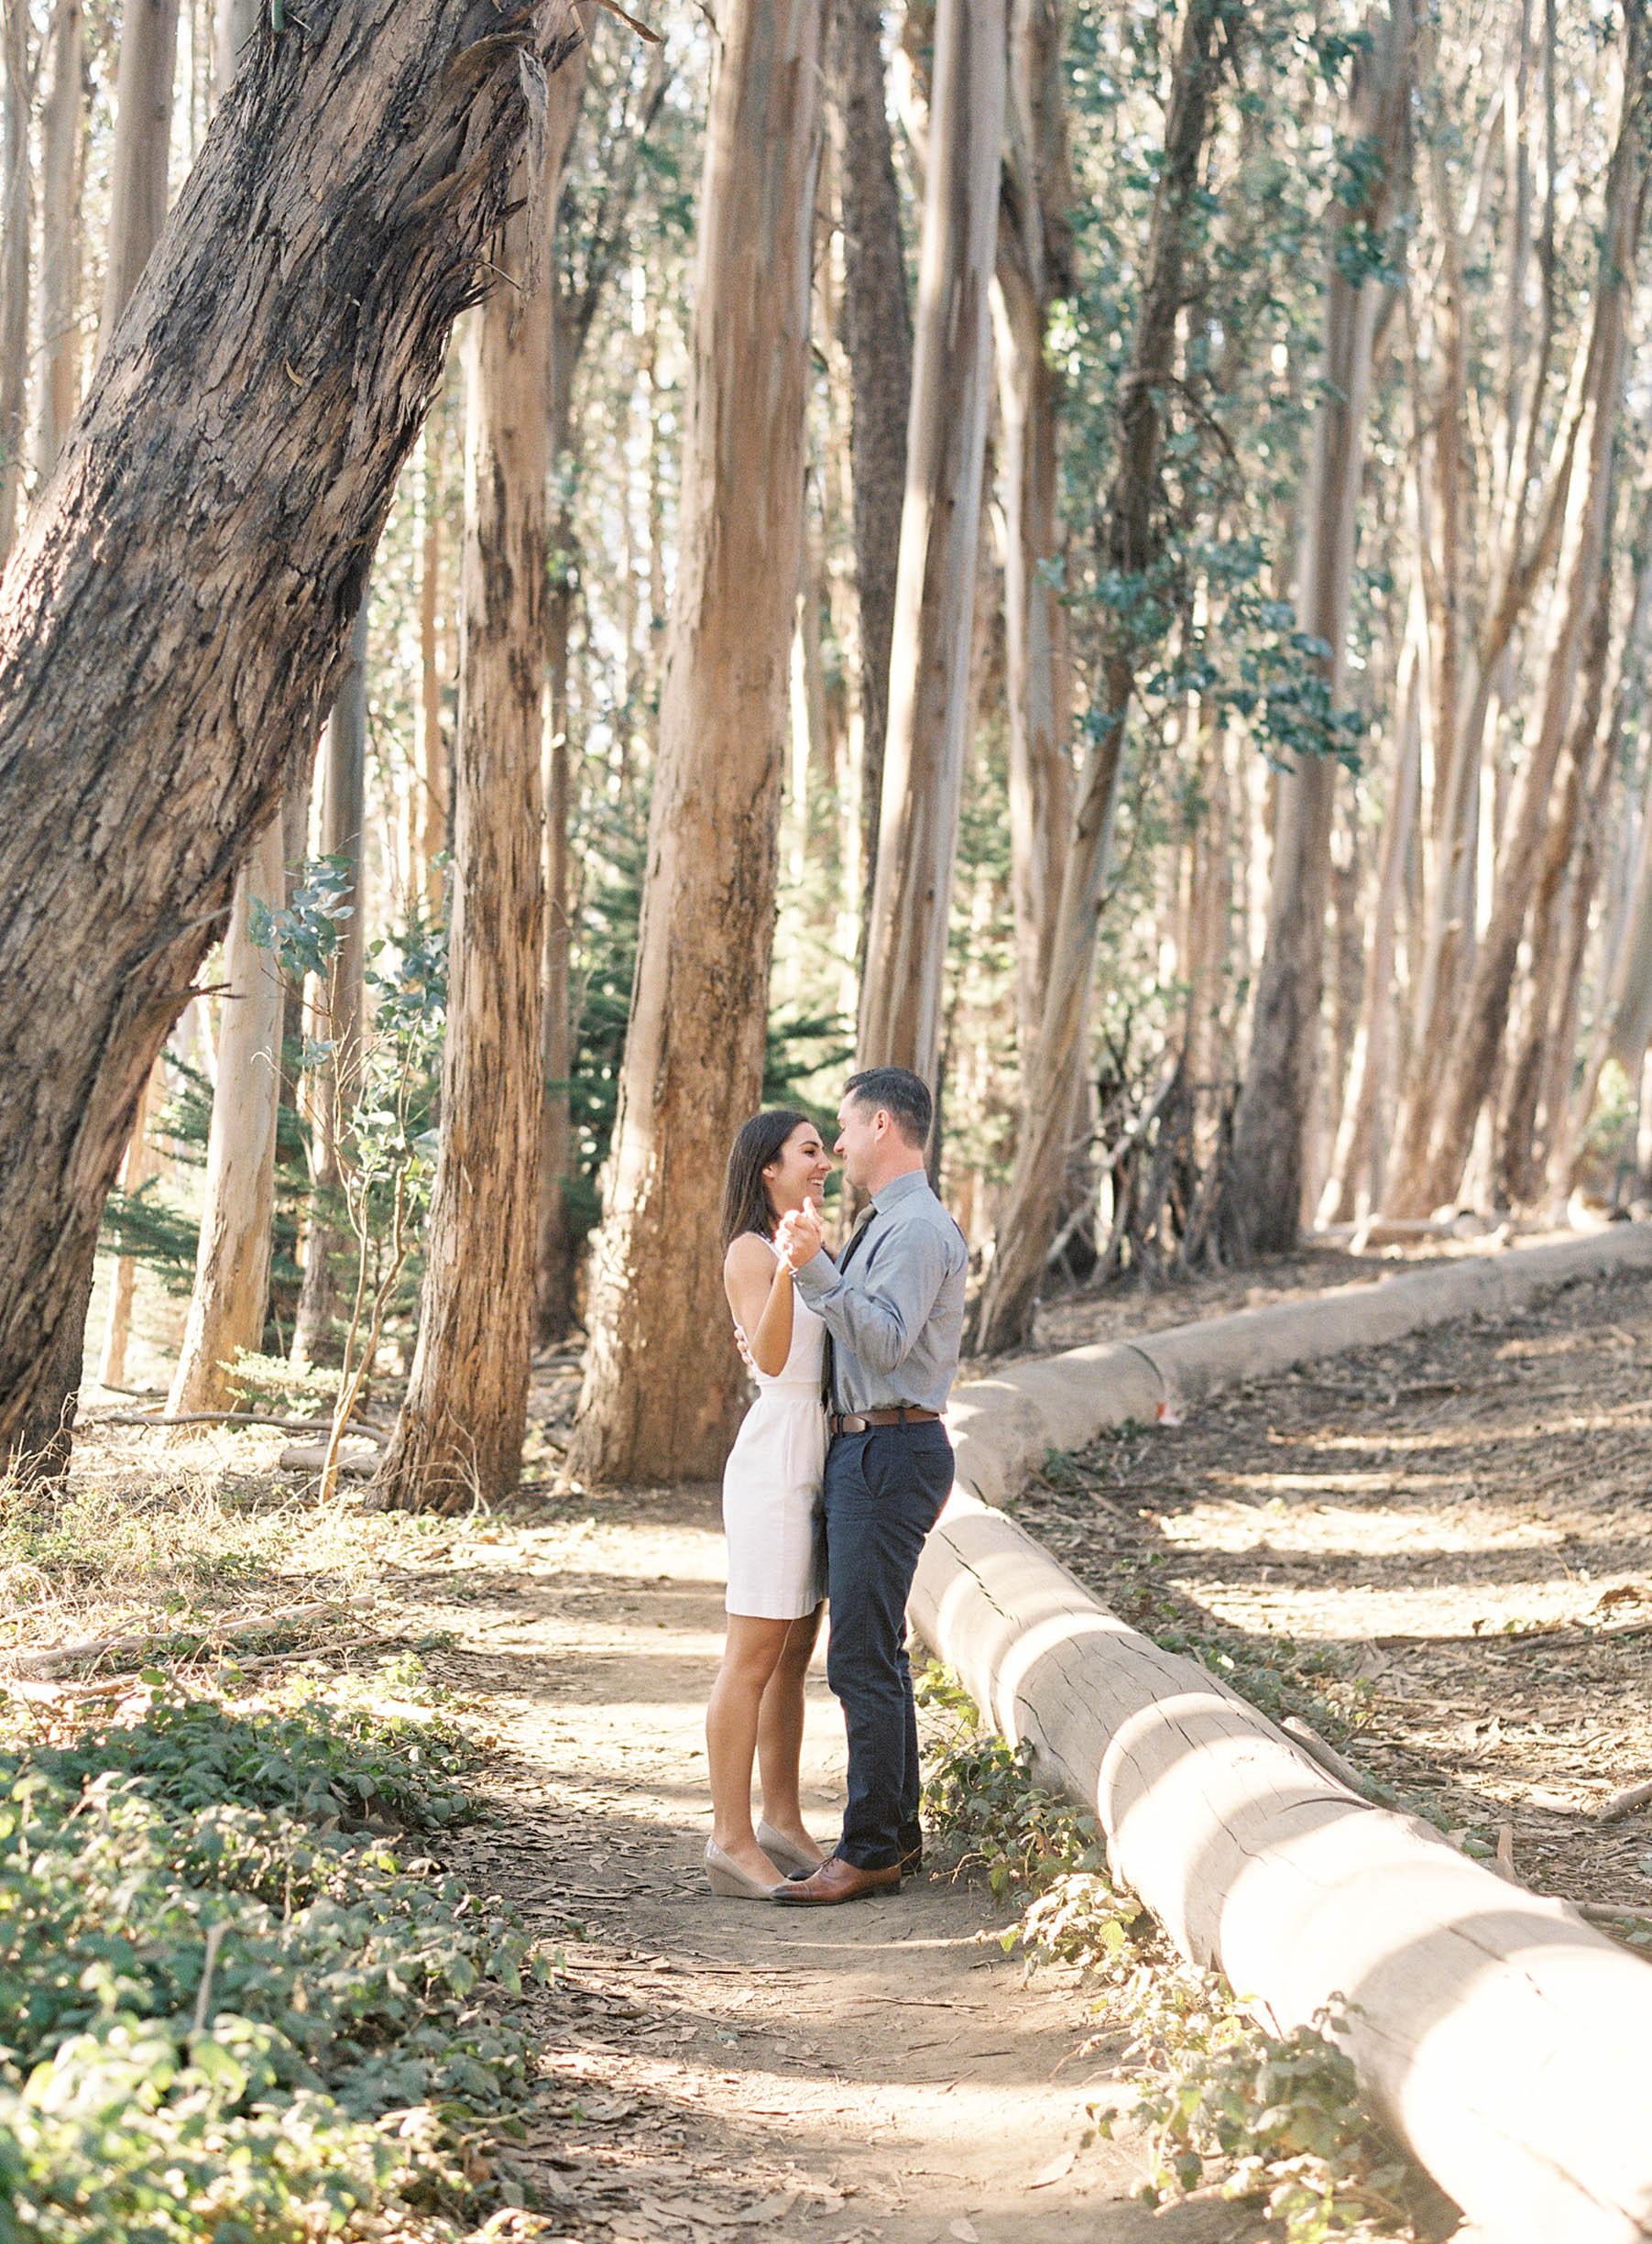 Meghan Mehan Photography - Fine Art Film Photography - California | San Francisco | Napa | Sonoma | Carmel | Big Sur | Santa Barbara | Nashville 022.jpg